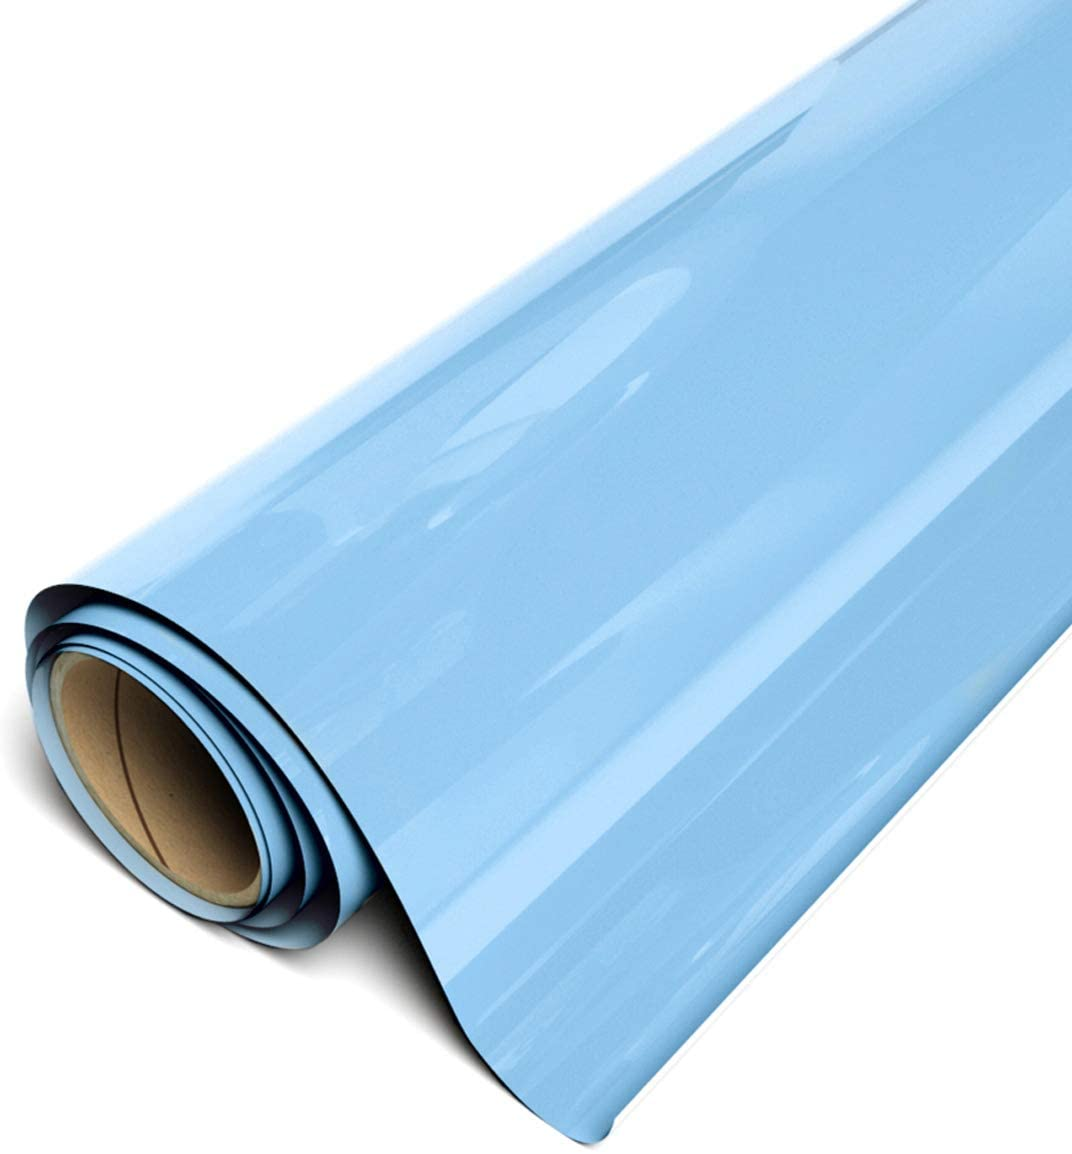 Power PU - Termocolante Recortável -Azul Bebe - 30 cm